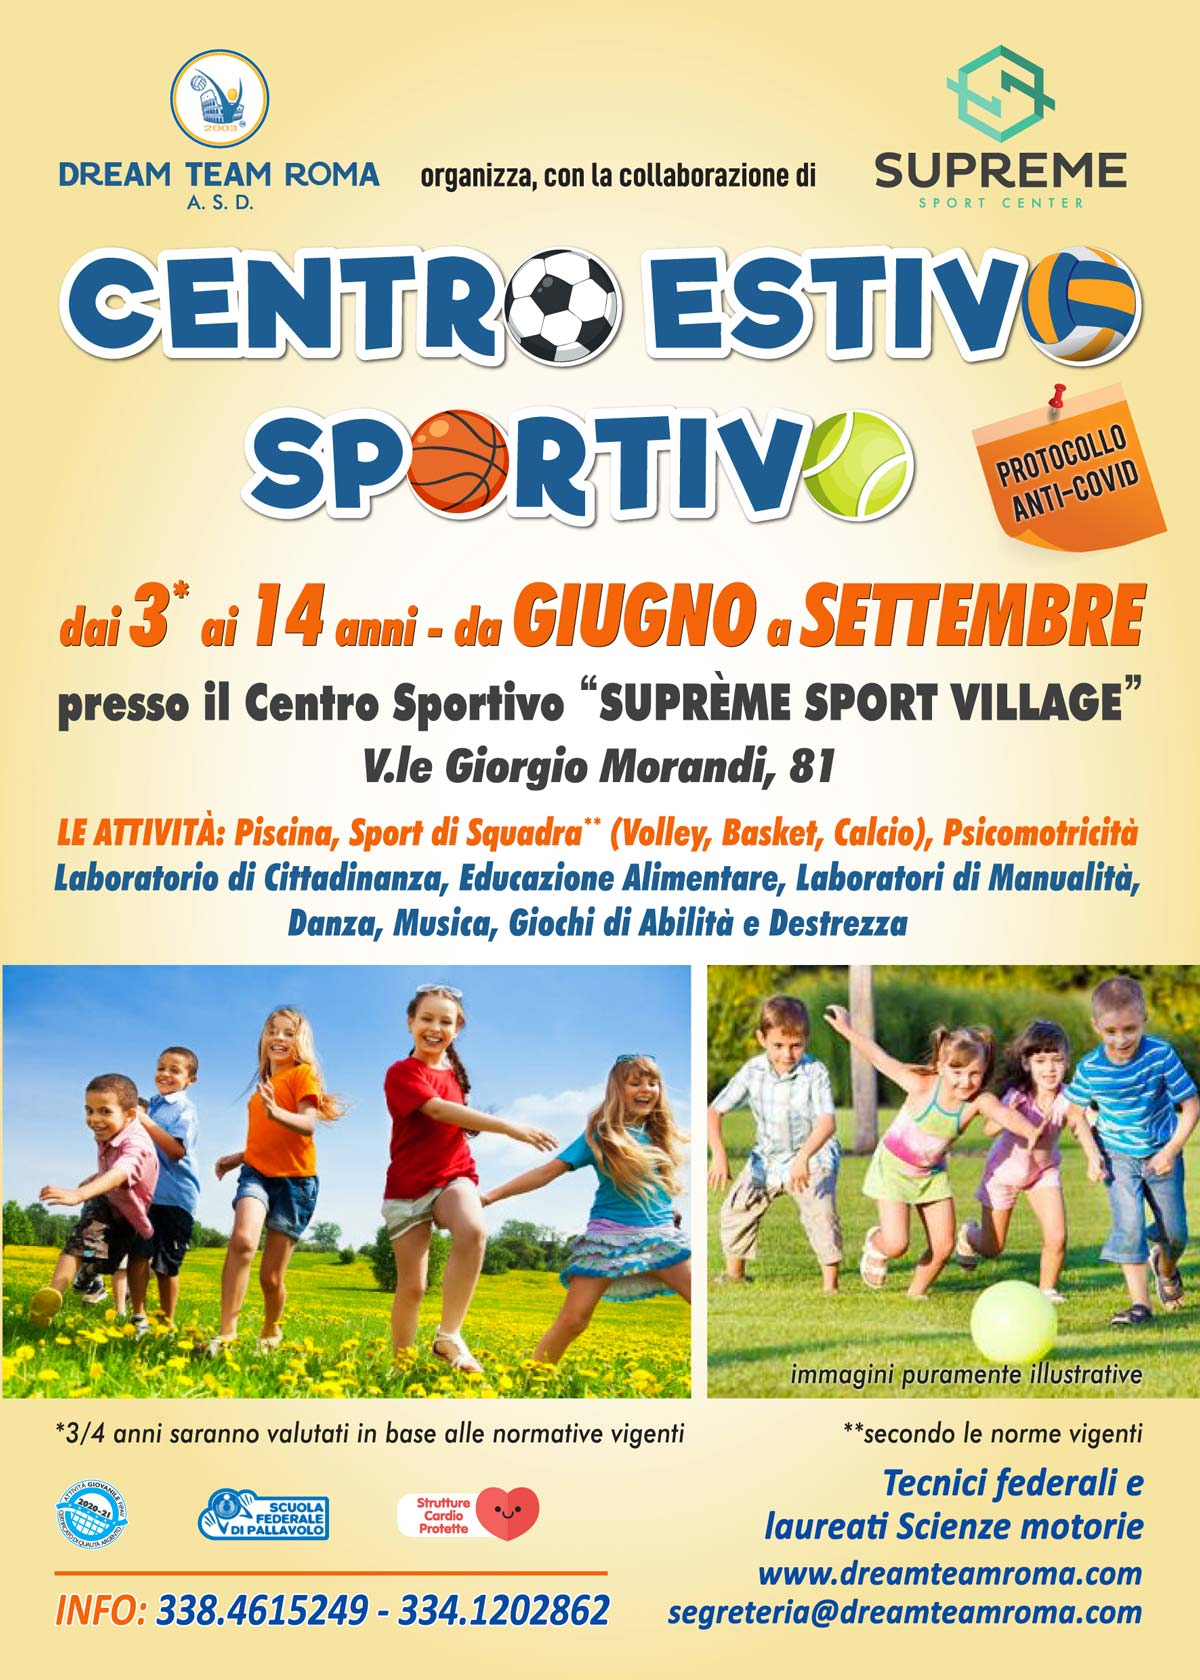 Centro Estivo Sportivo